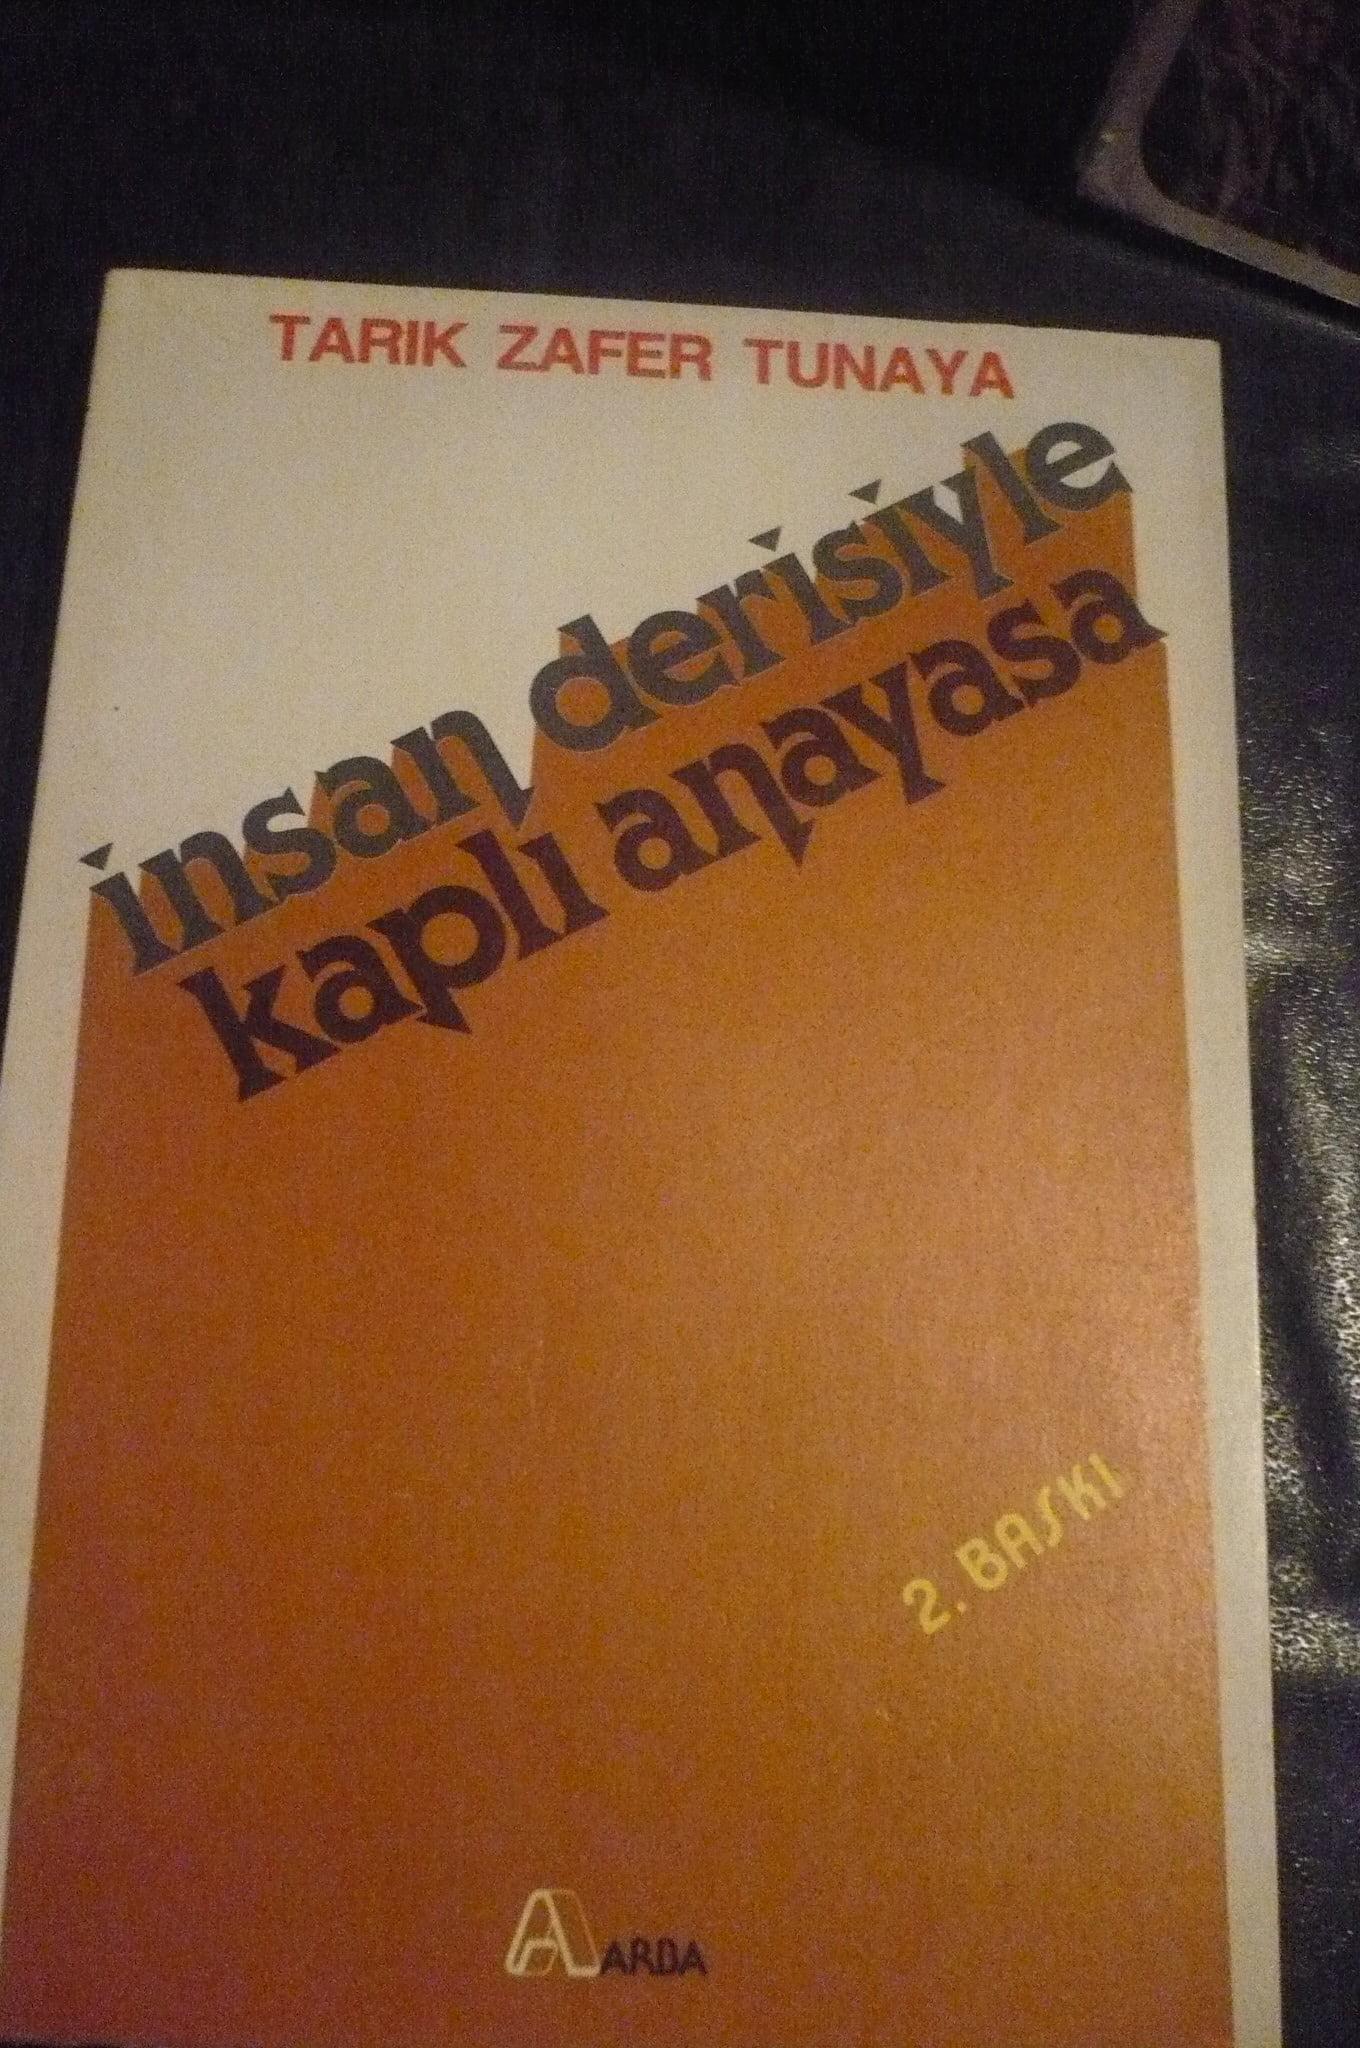 İNSAN DERİSİYLE KAPLI ANAYASA/Tarık Zafer Tunaya/15 TL